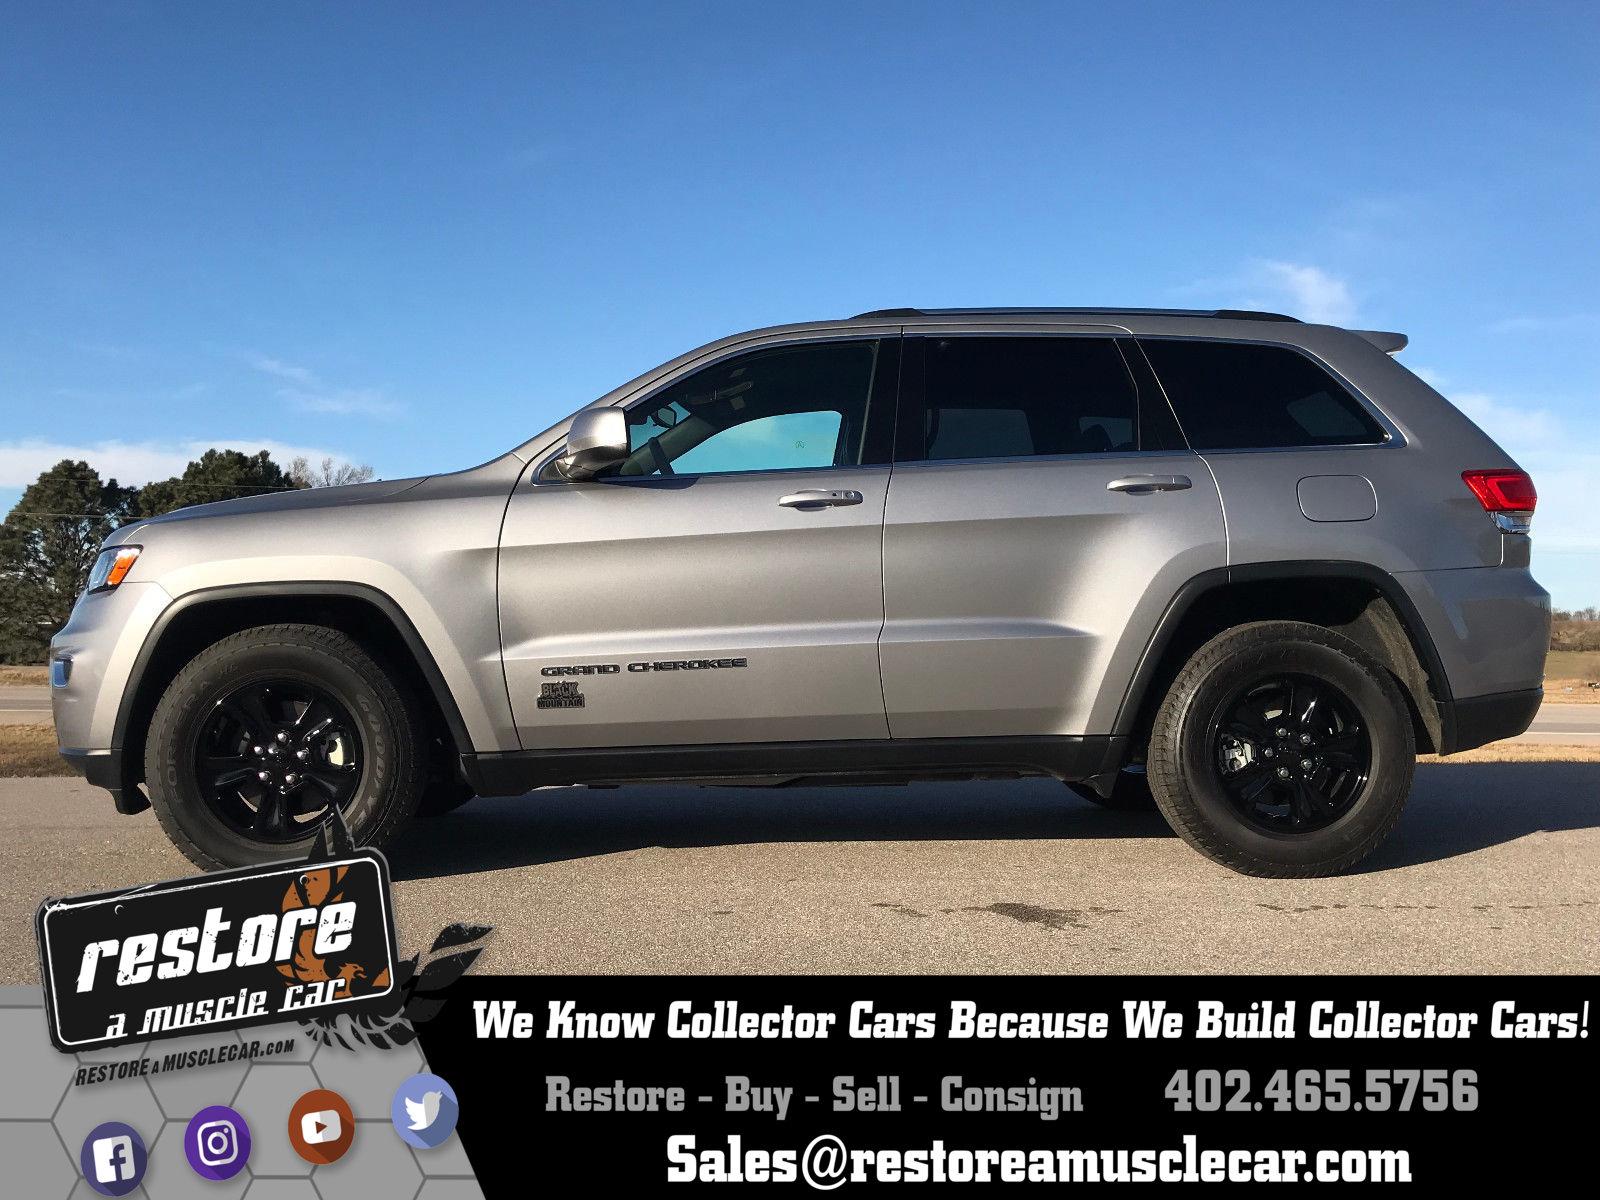 243315437176c hd 2017 jeep grand cherokee laredo